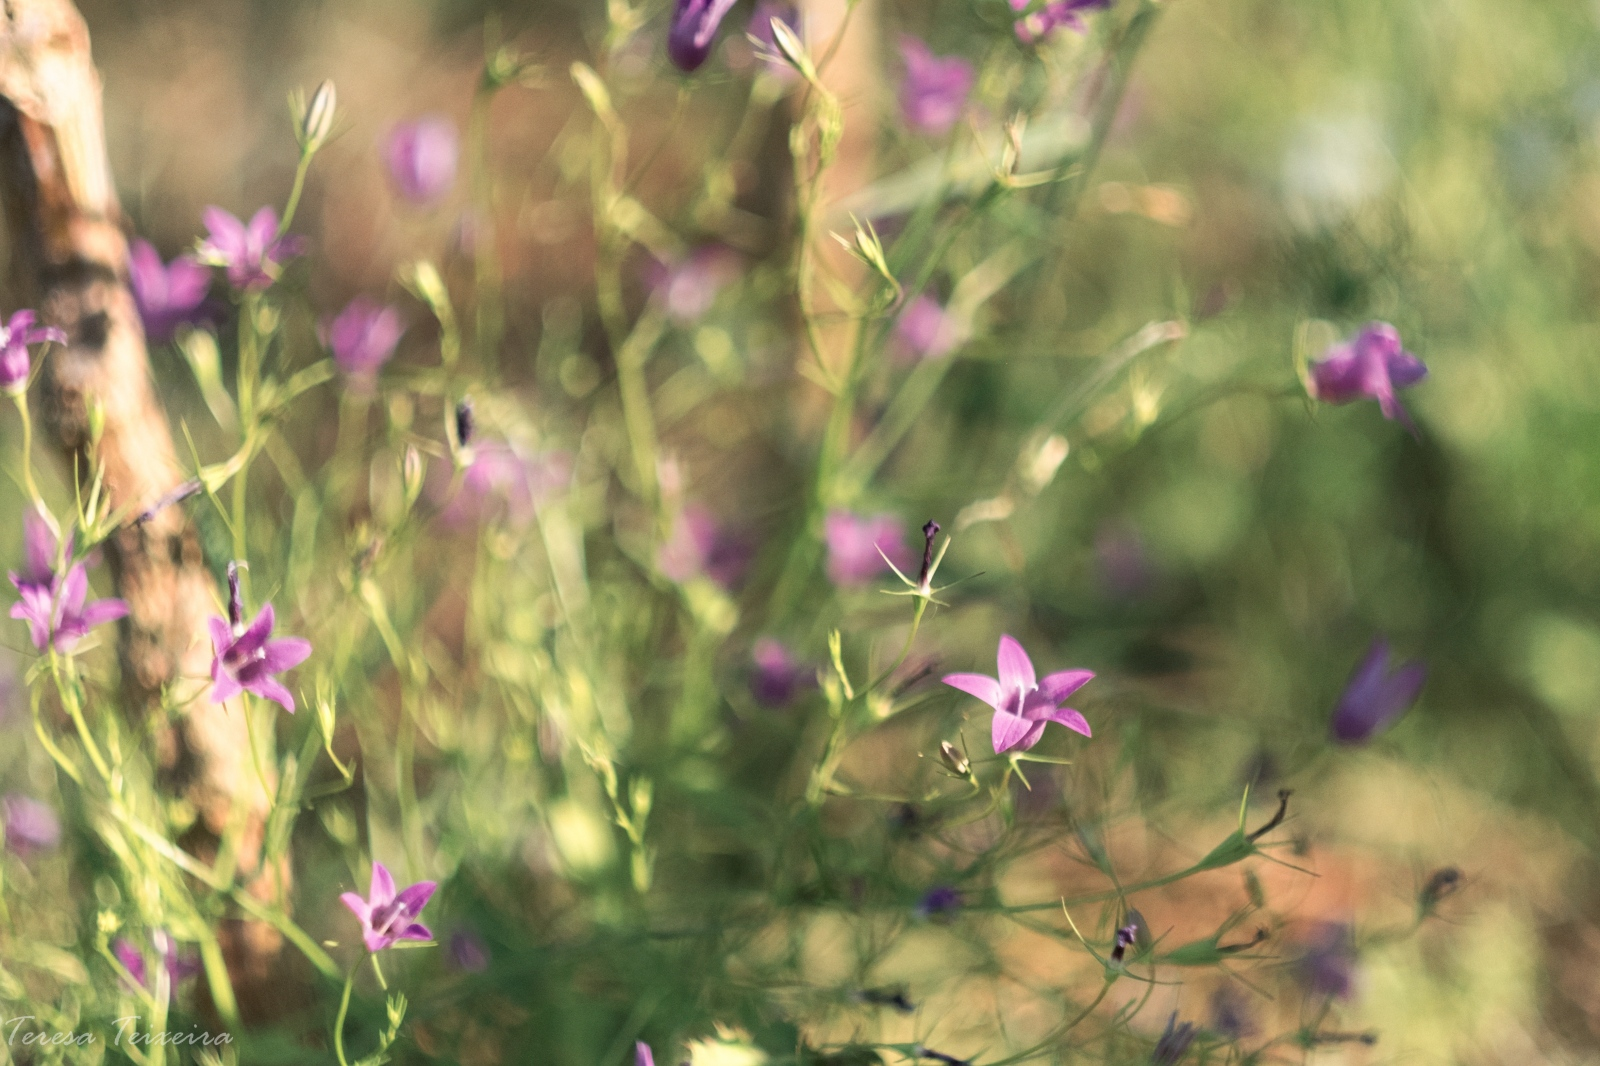 Art and Documentary Photography - Loading DSCF2976-Edit.jpg